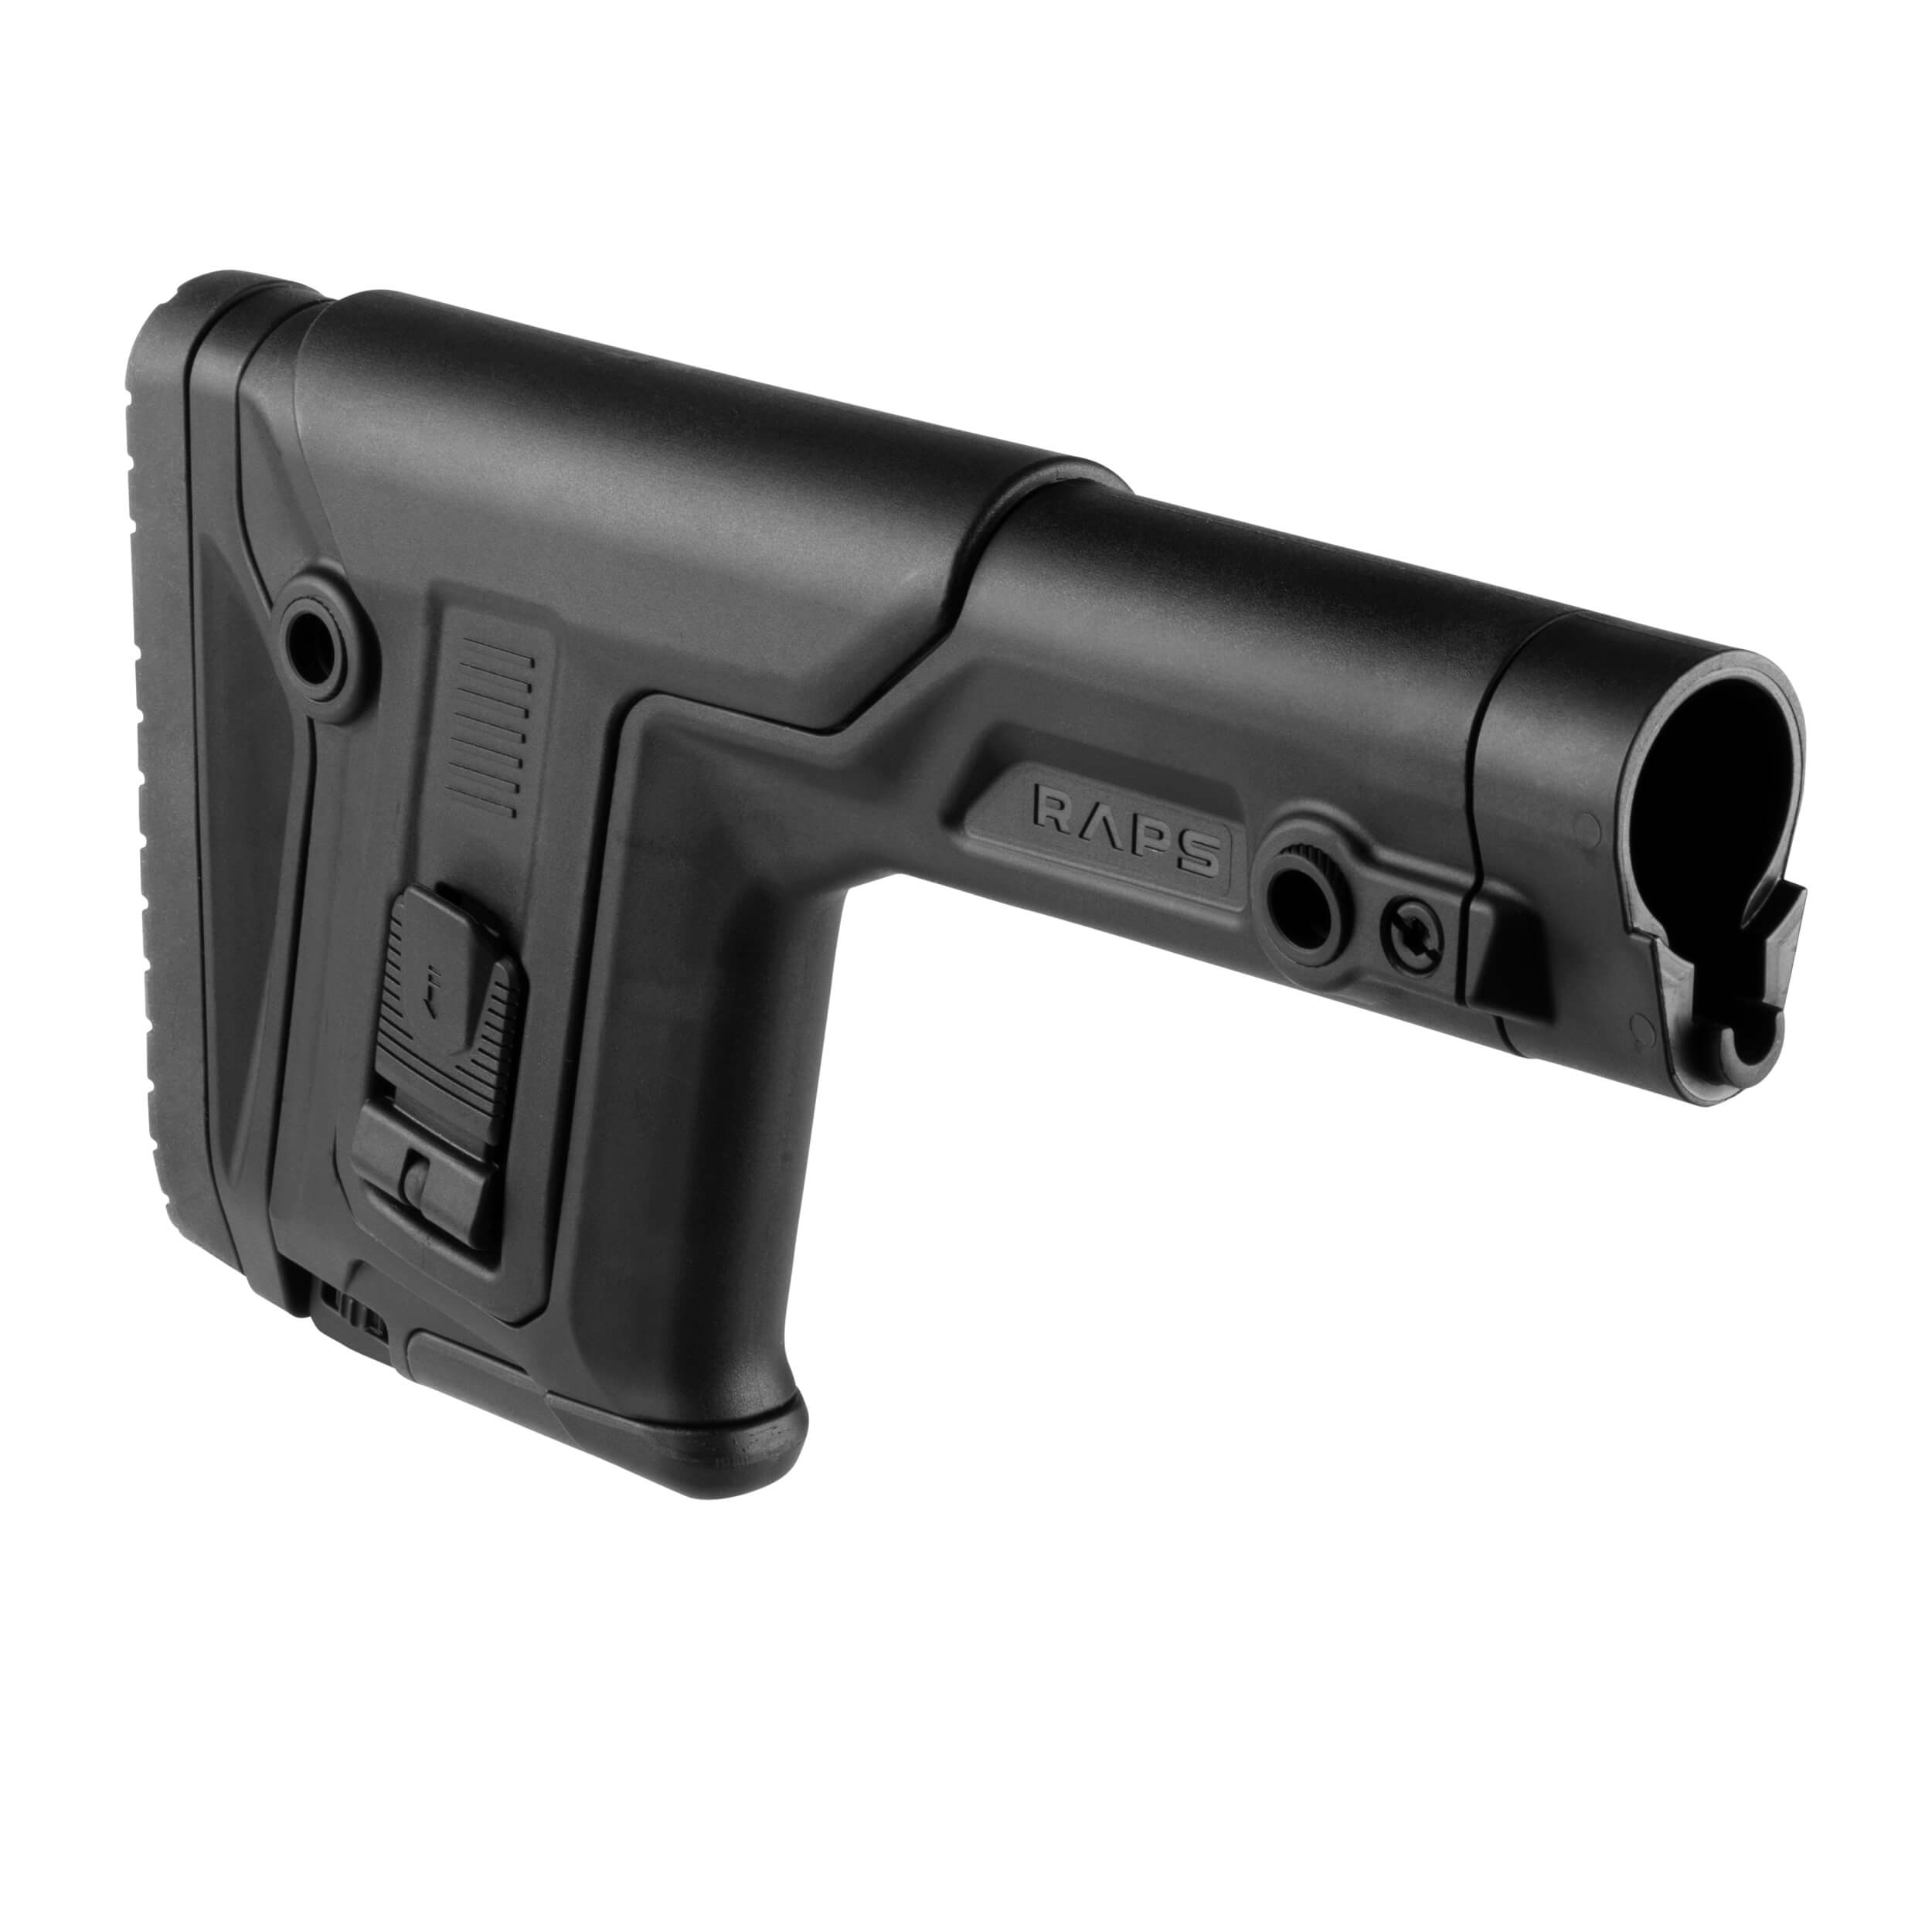 RAPS Sniper Rapid Adjustment Precision Stock for M-16 / AR15 / SR-25